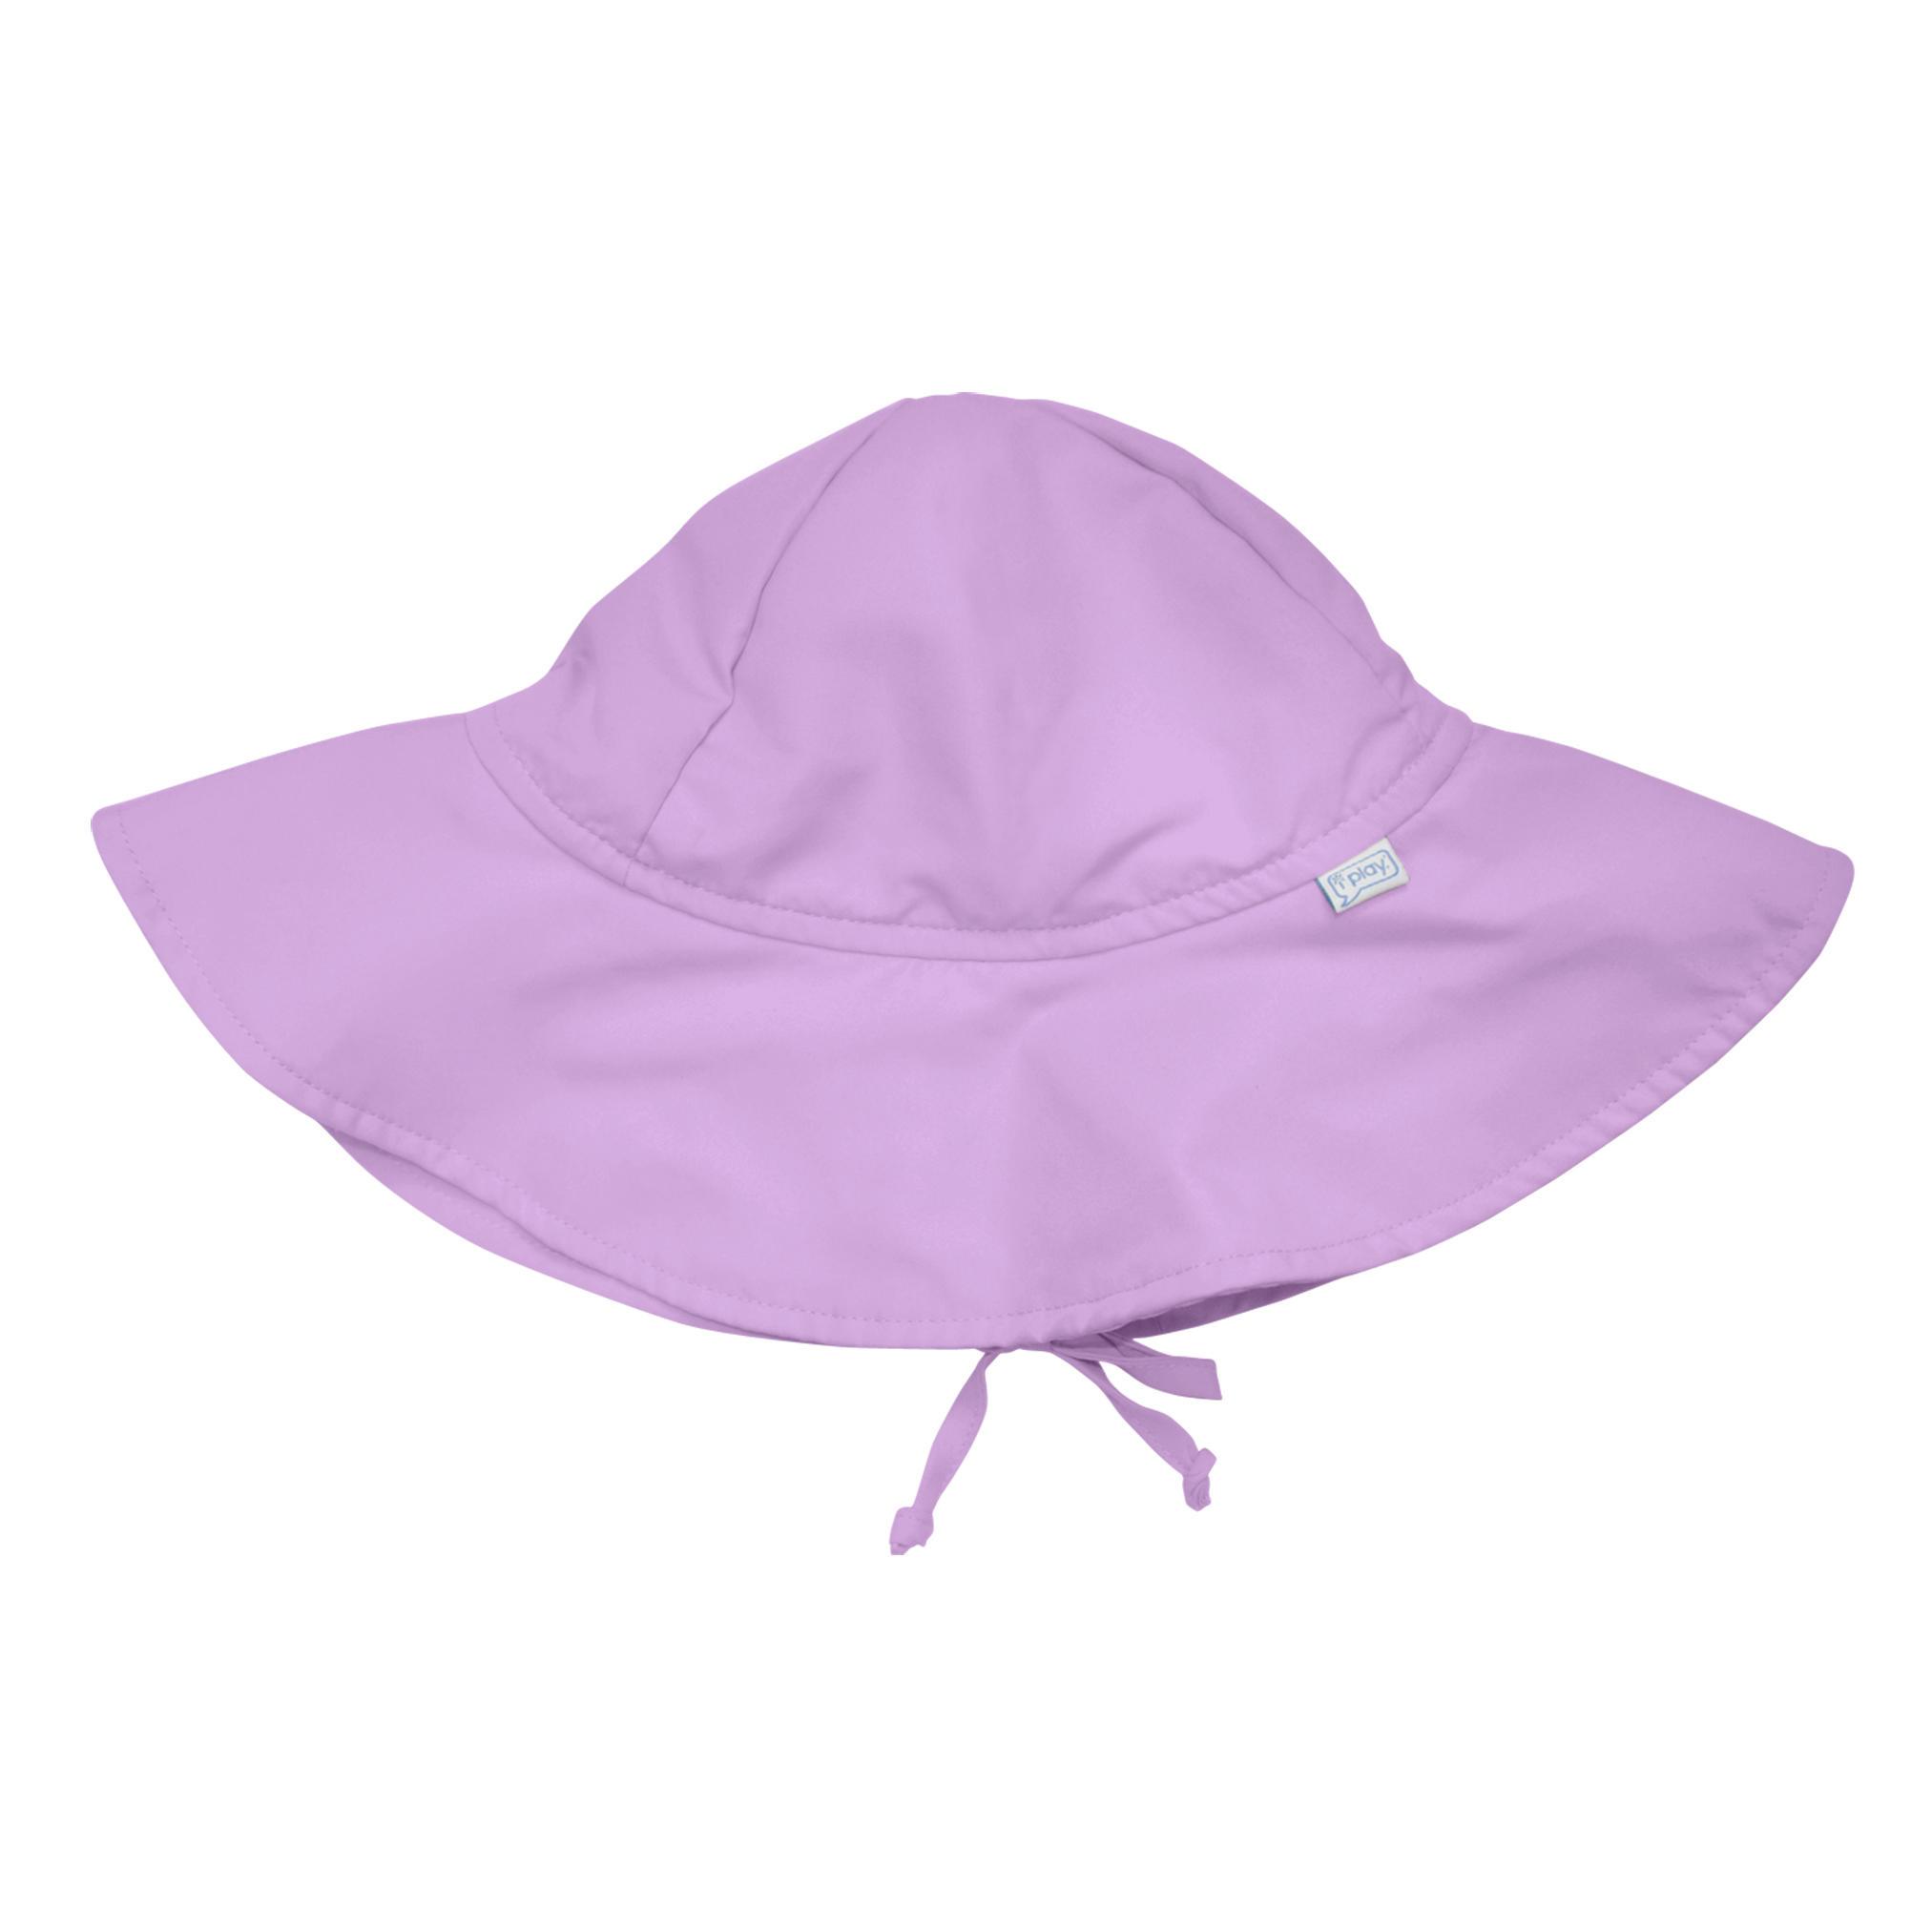 Sombrero Brim con Filtro UV Lavanda I Play